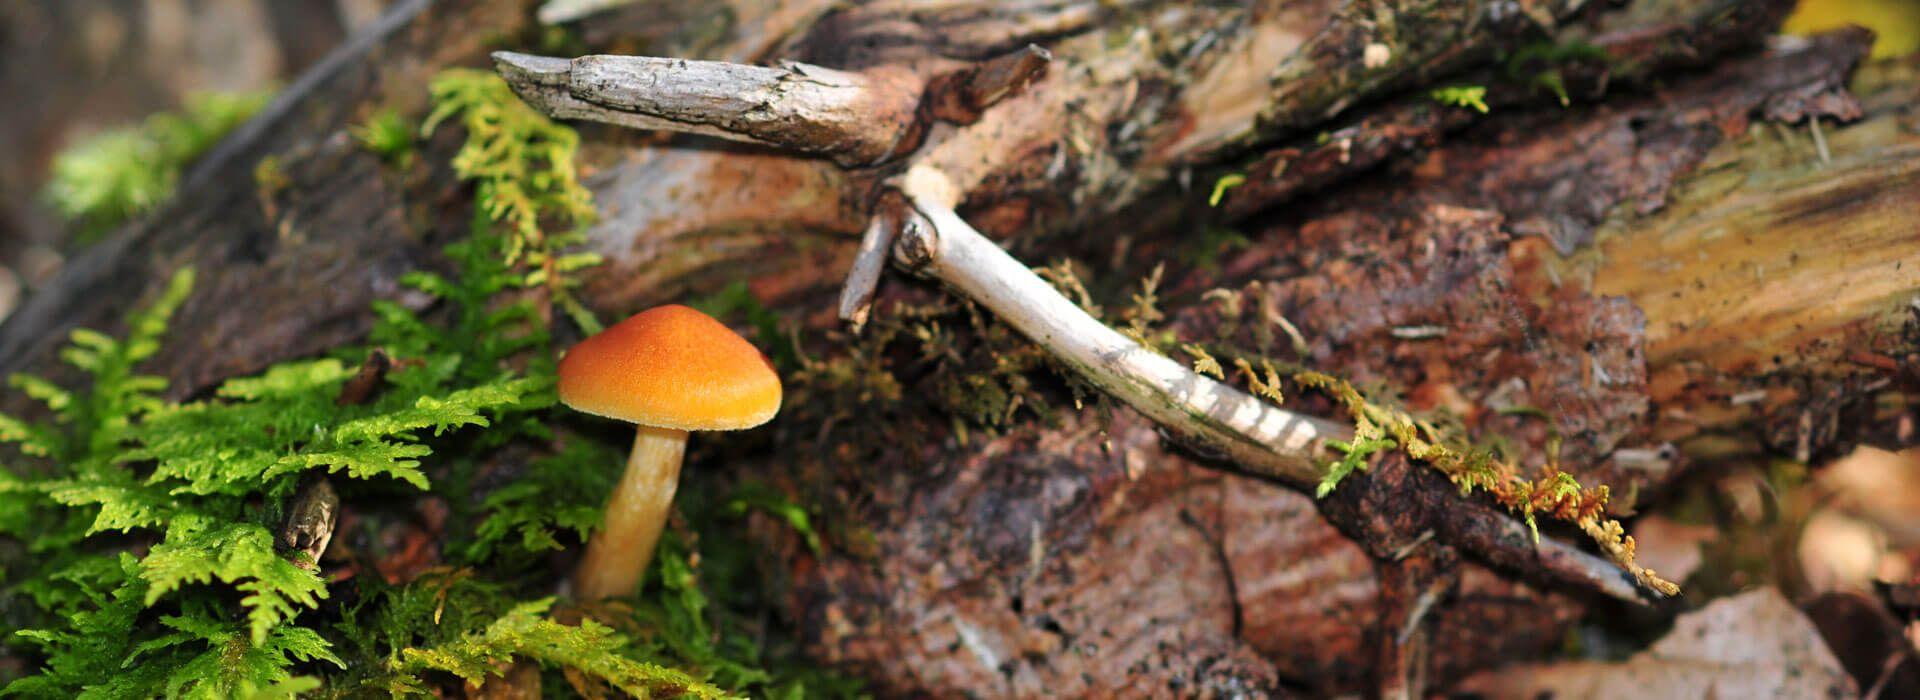 Totholz mit Moos und Pilz